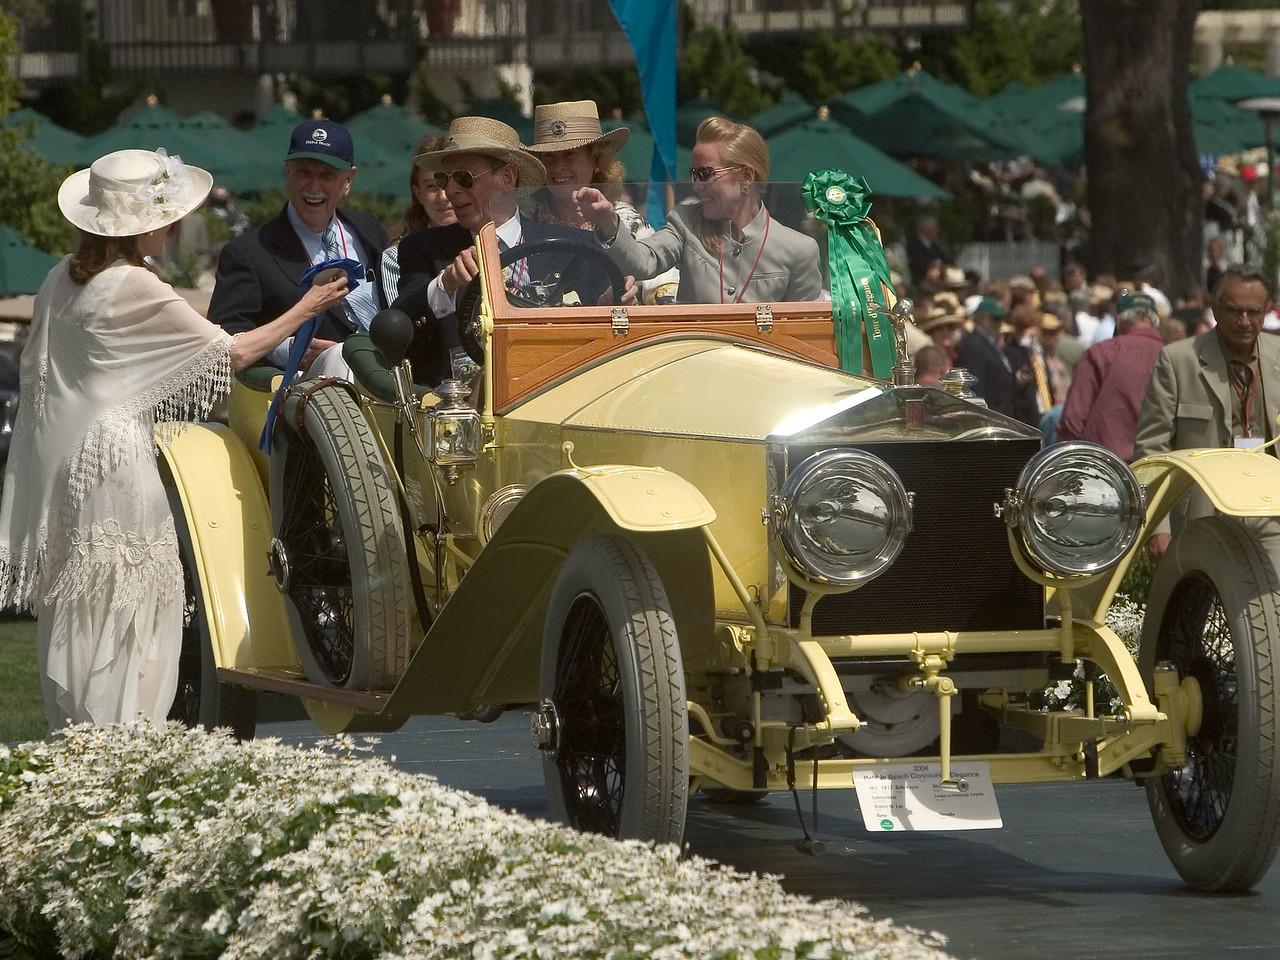 1912 Rolls-Royce Silver Ghost Labourdette London to Edinburgh Torpédo. 1st RR Silver Ghost 1907-15.  Robert Lee